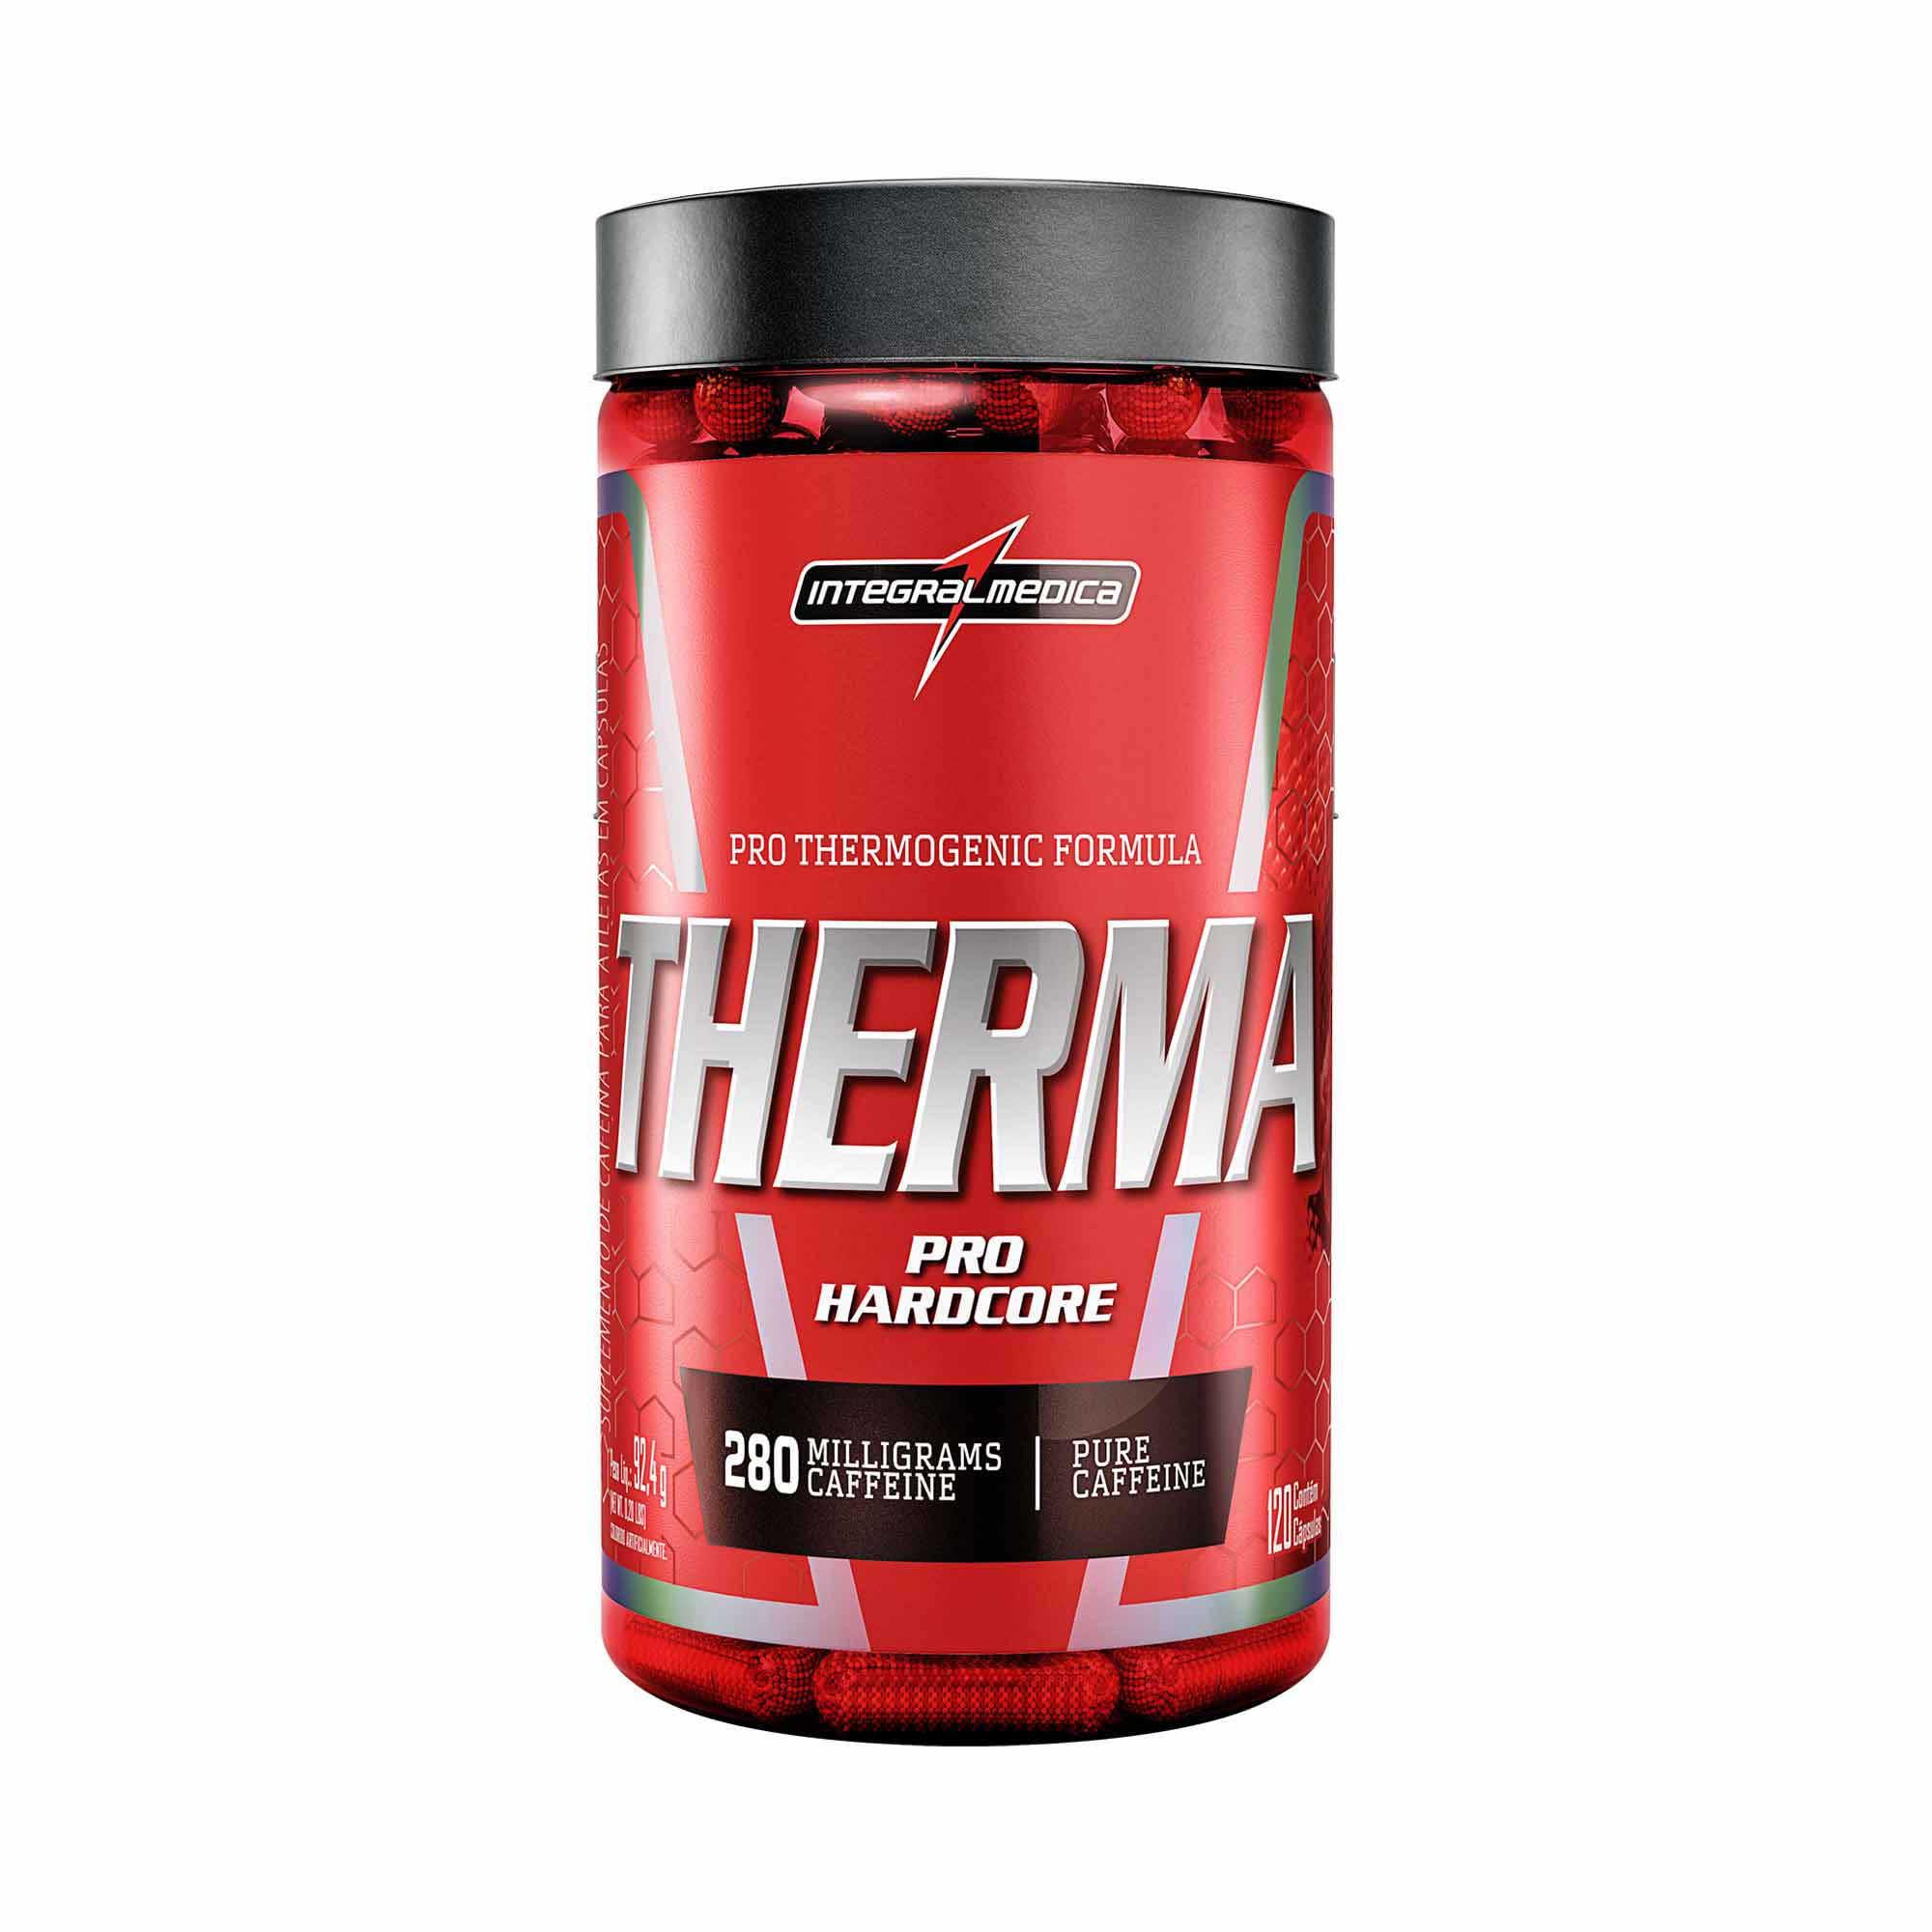 Therma Pro Hardcore 120 cápsulas Integralmedica